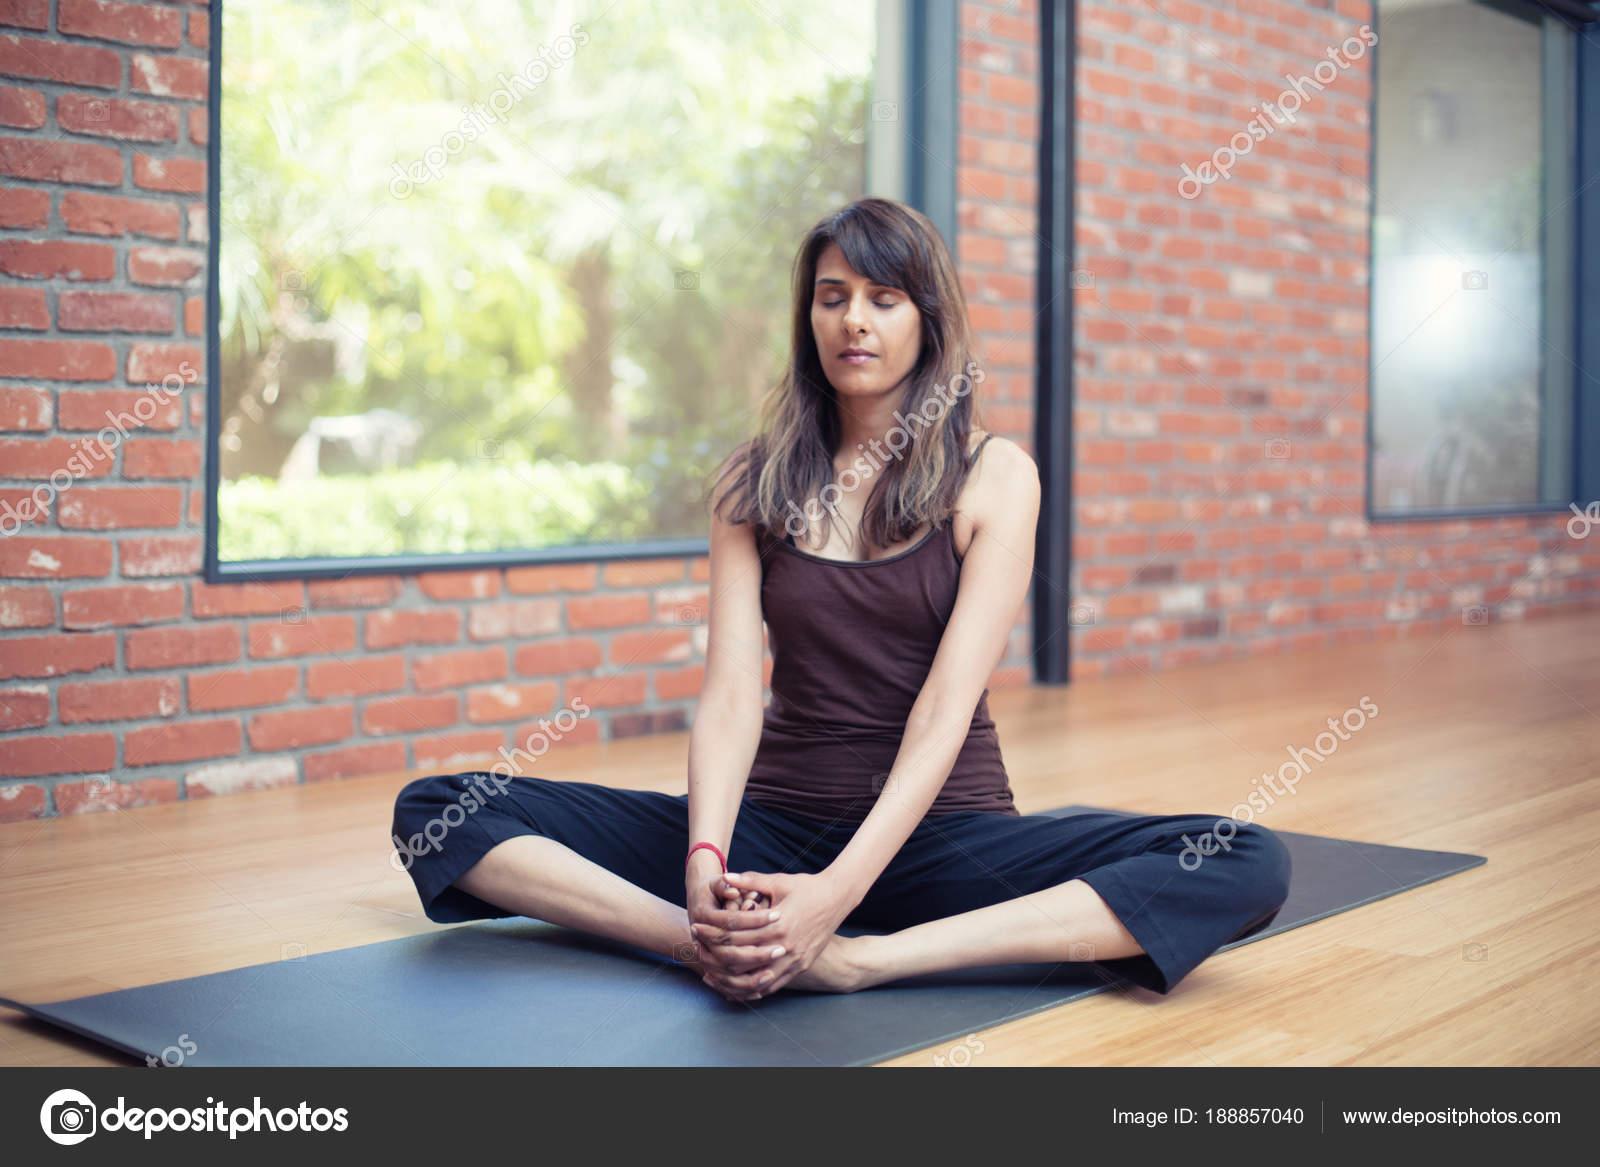 Indian Girl Practicing Yoga In A Studio Stock Photo C Lstock 188857040